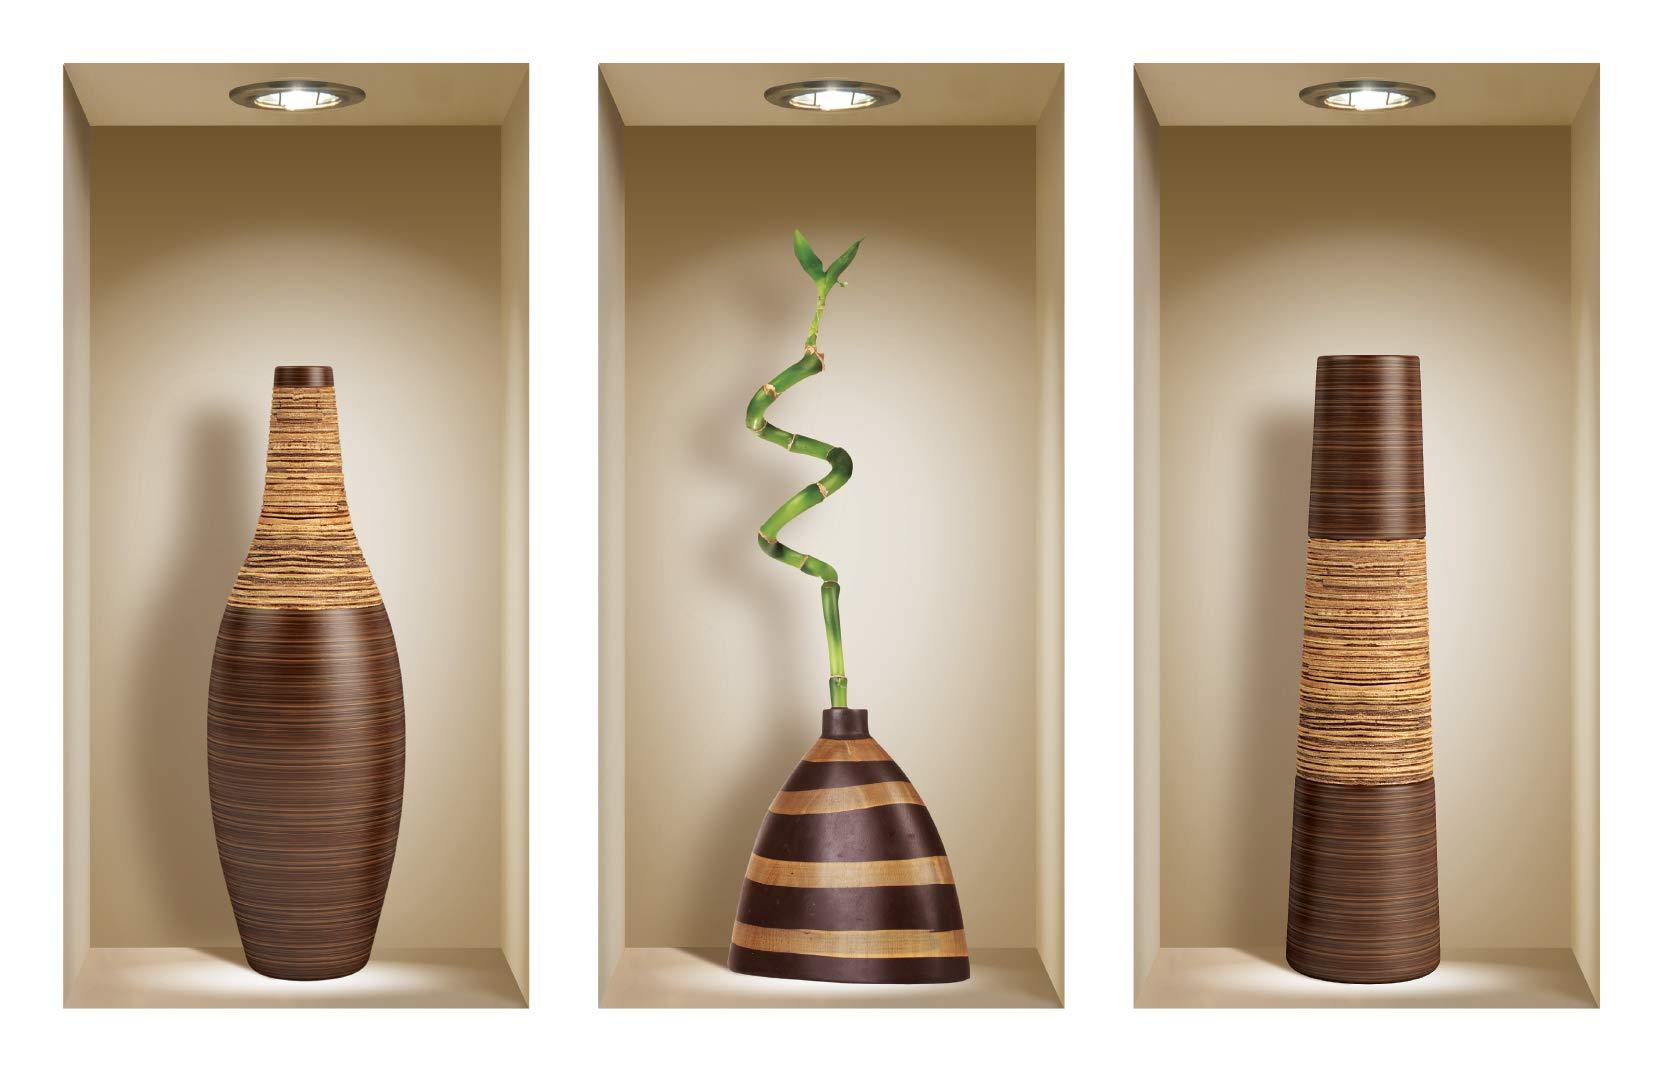 The Nisha Art Magic 3D Vinyl Removable Wall Sticker Decals DIY, Set of 3, Brown Vases